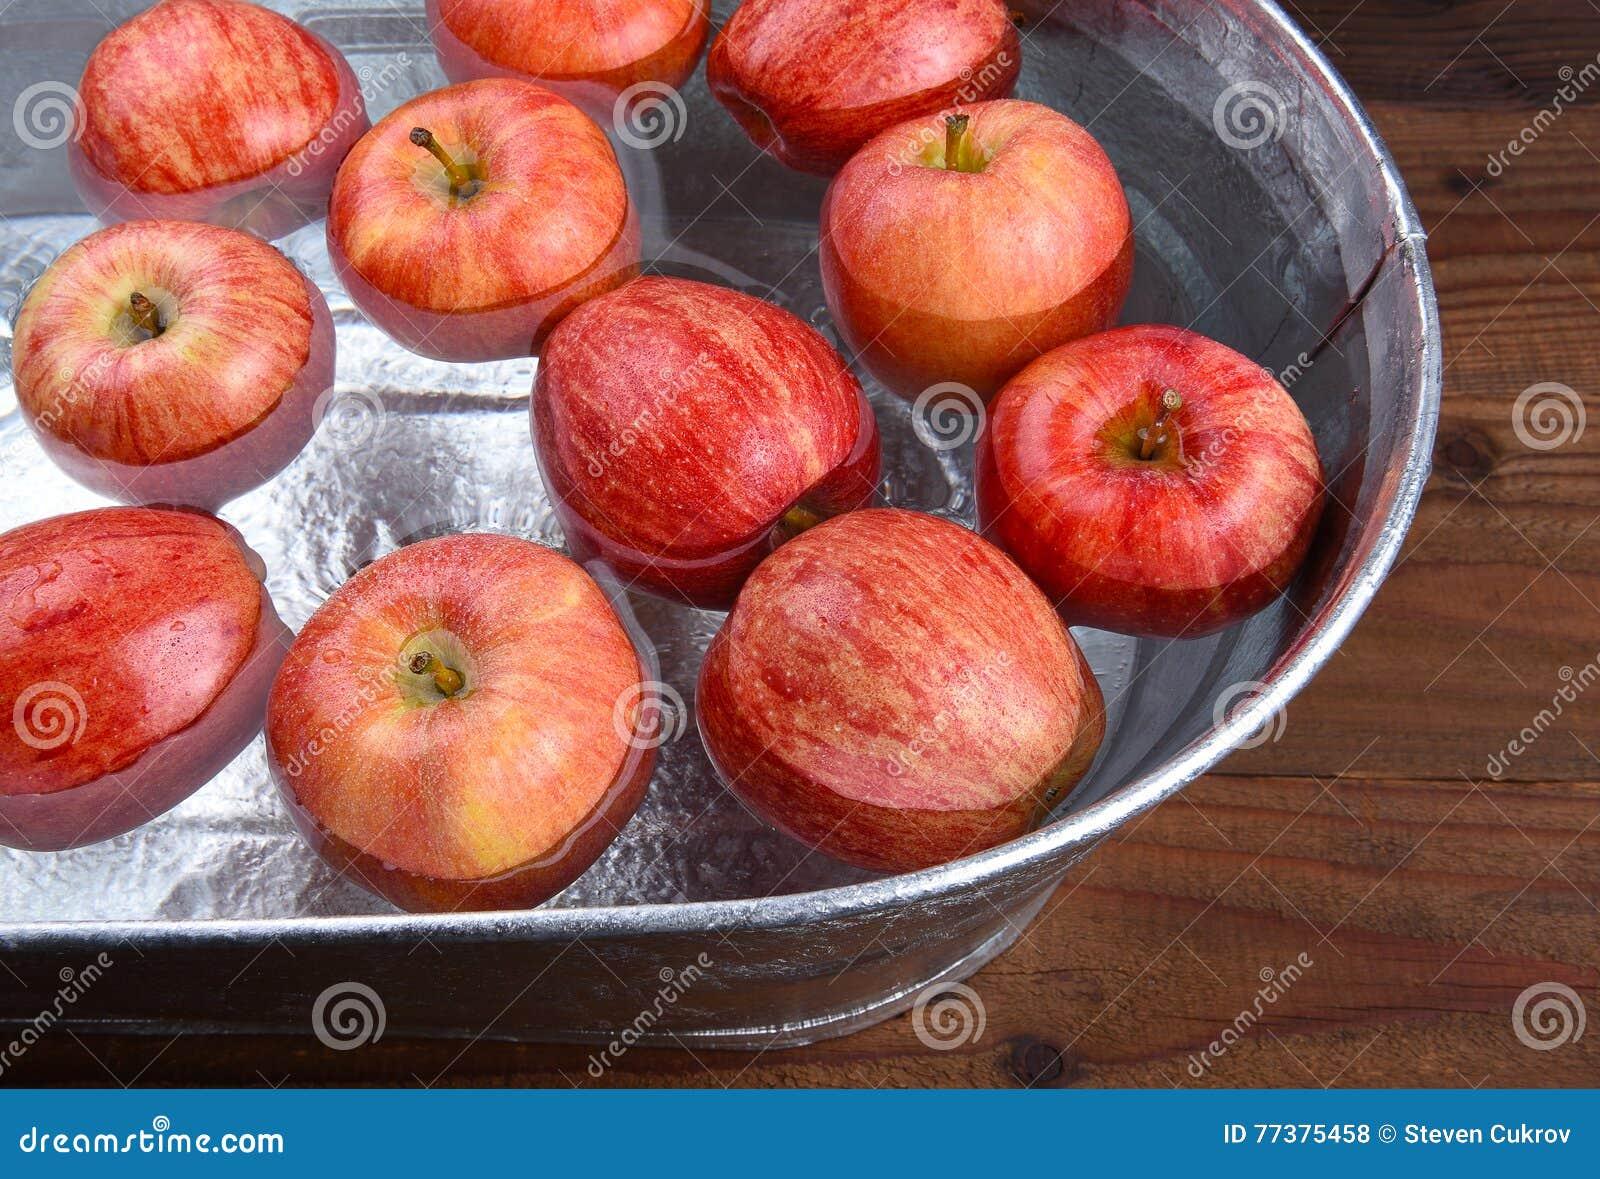 Apple Bobbing Tub